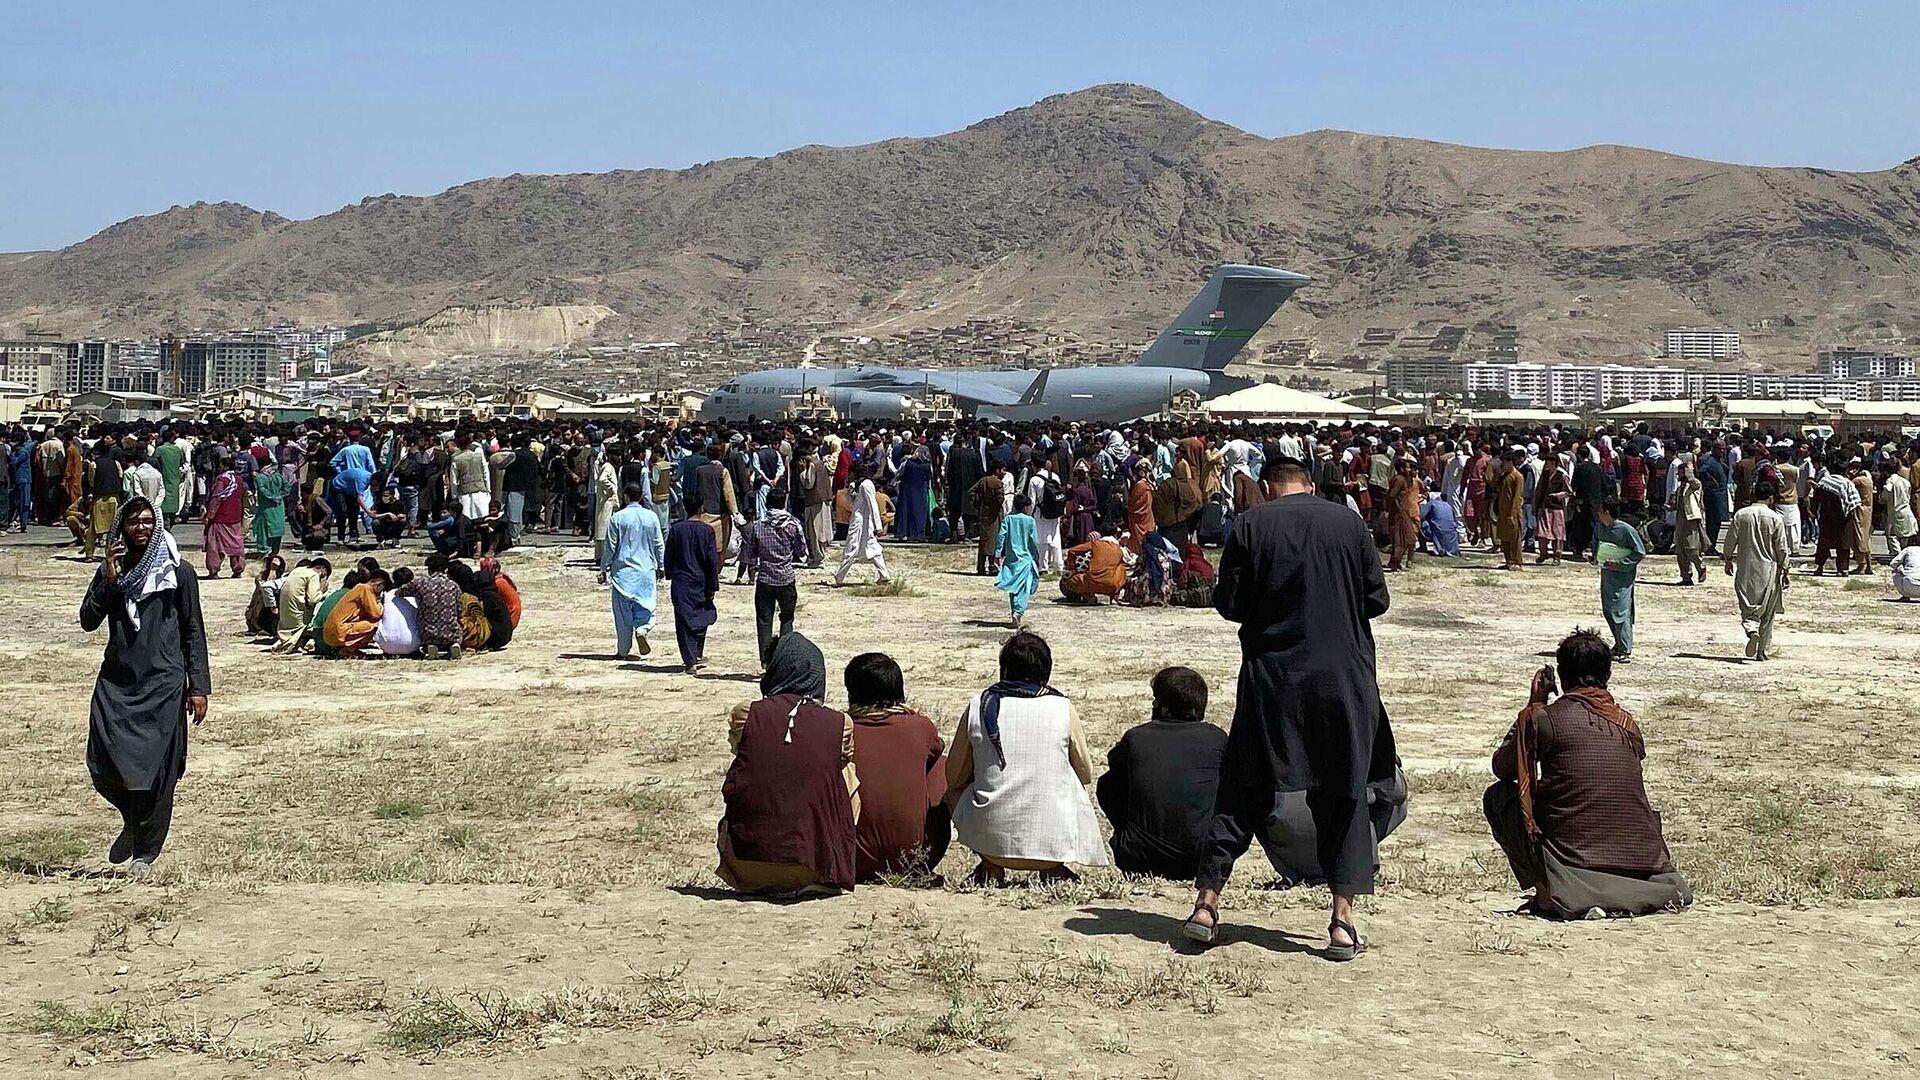 Люди в аэропорту Кабула - РИА Новости, 1920, 24.08.2021